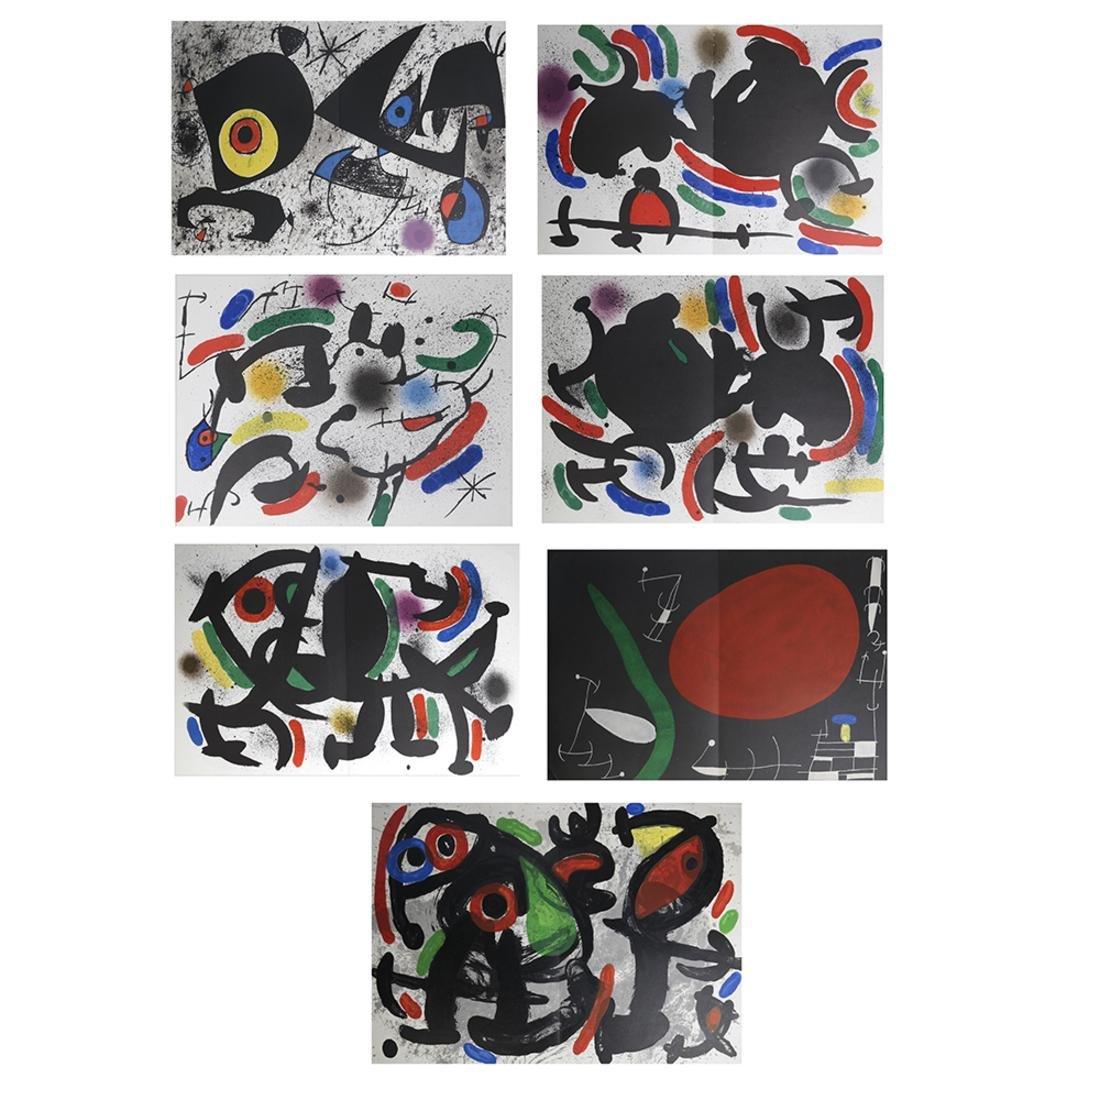 Joan Miro (1893-1983) 5 Lithographs